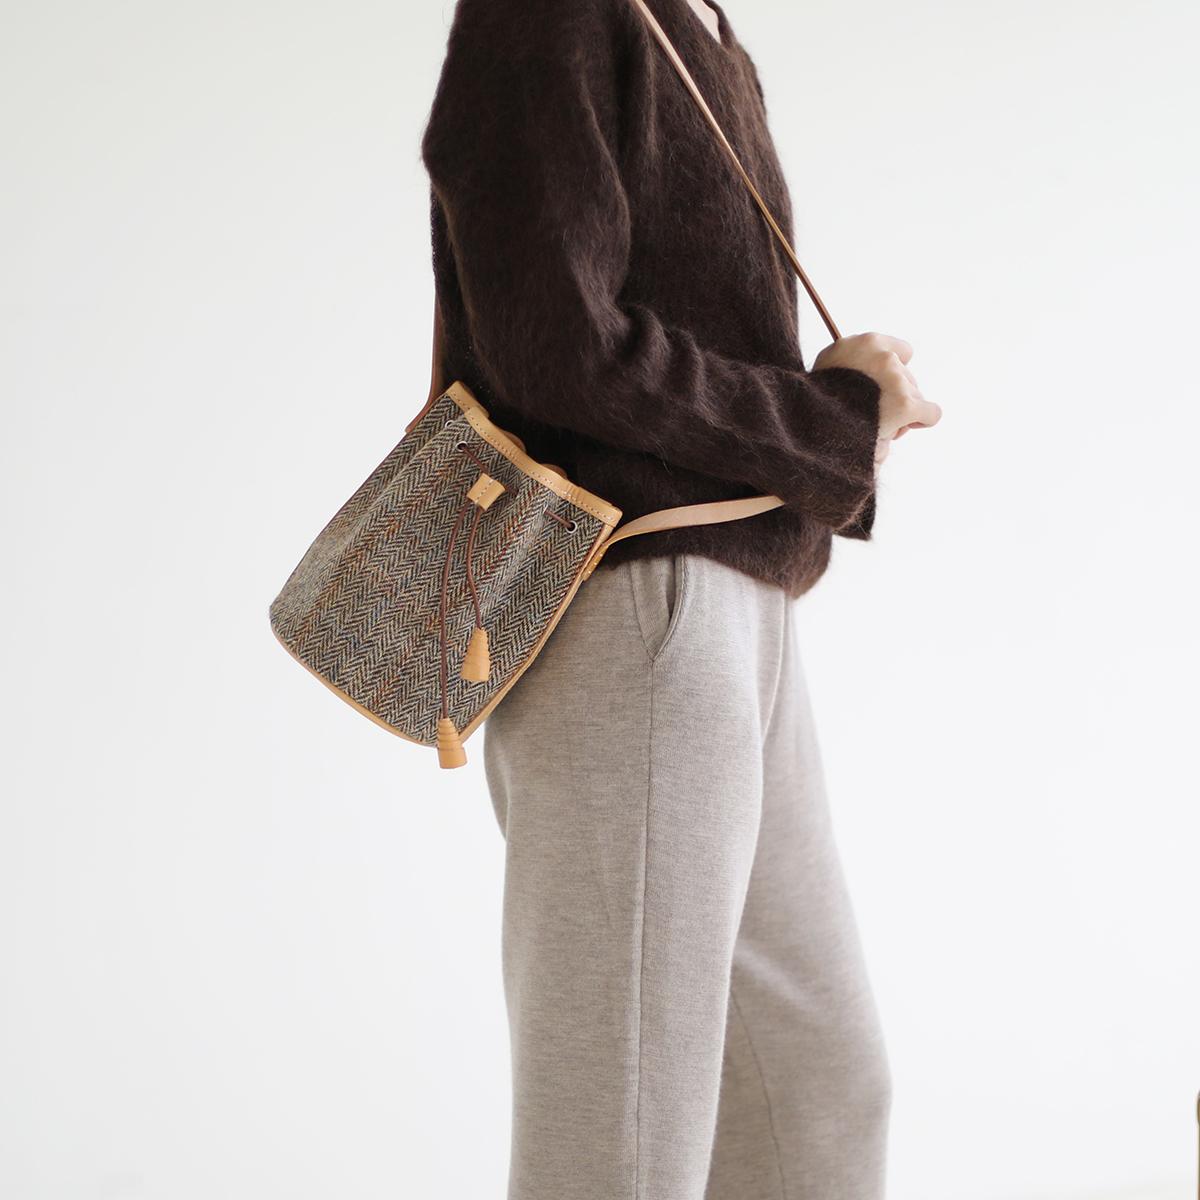 JOYDIVISION harris tweed  手工水桶包  单肩复古包包女士